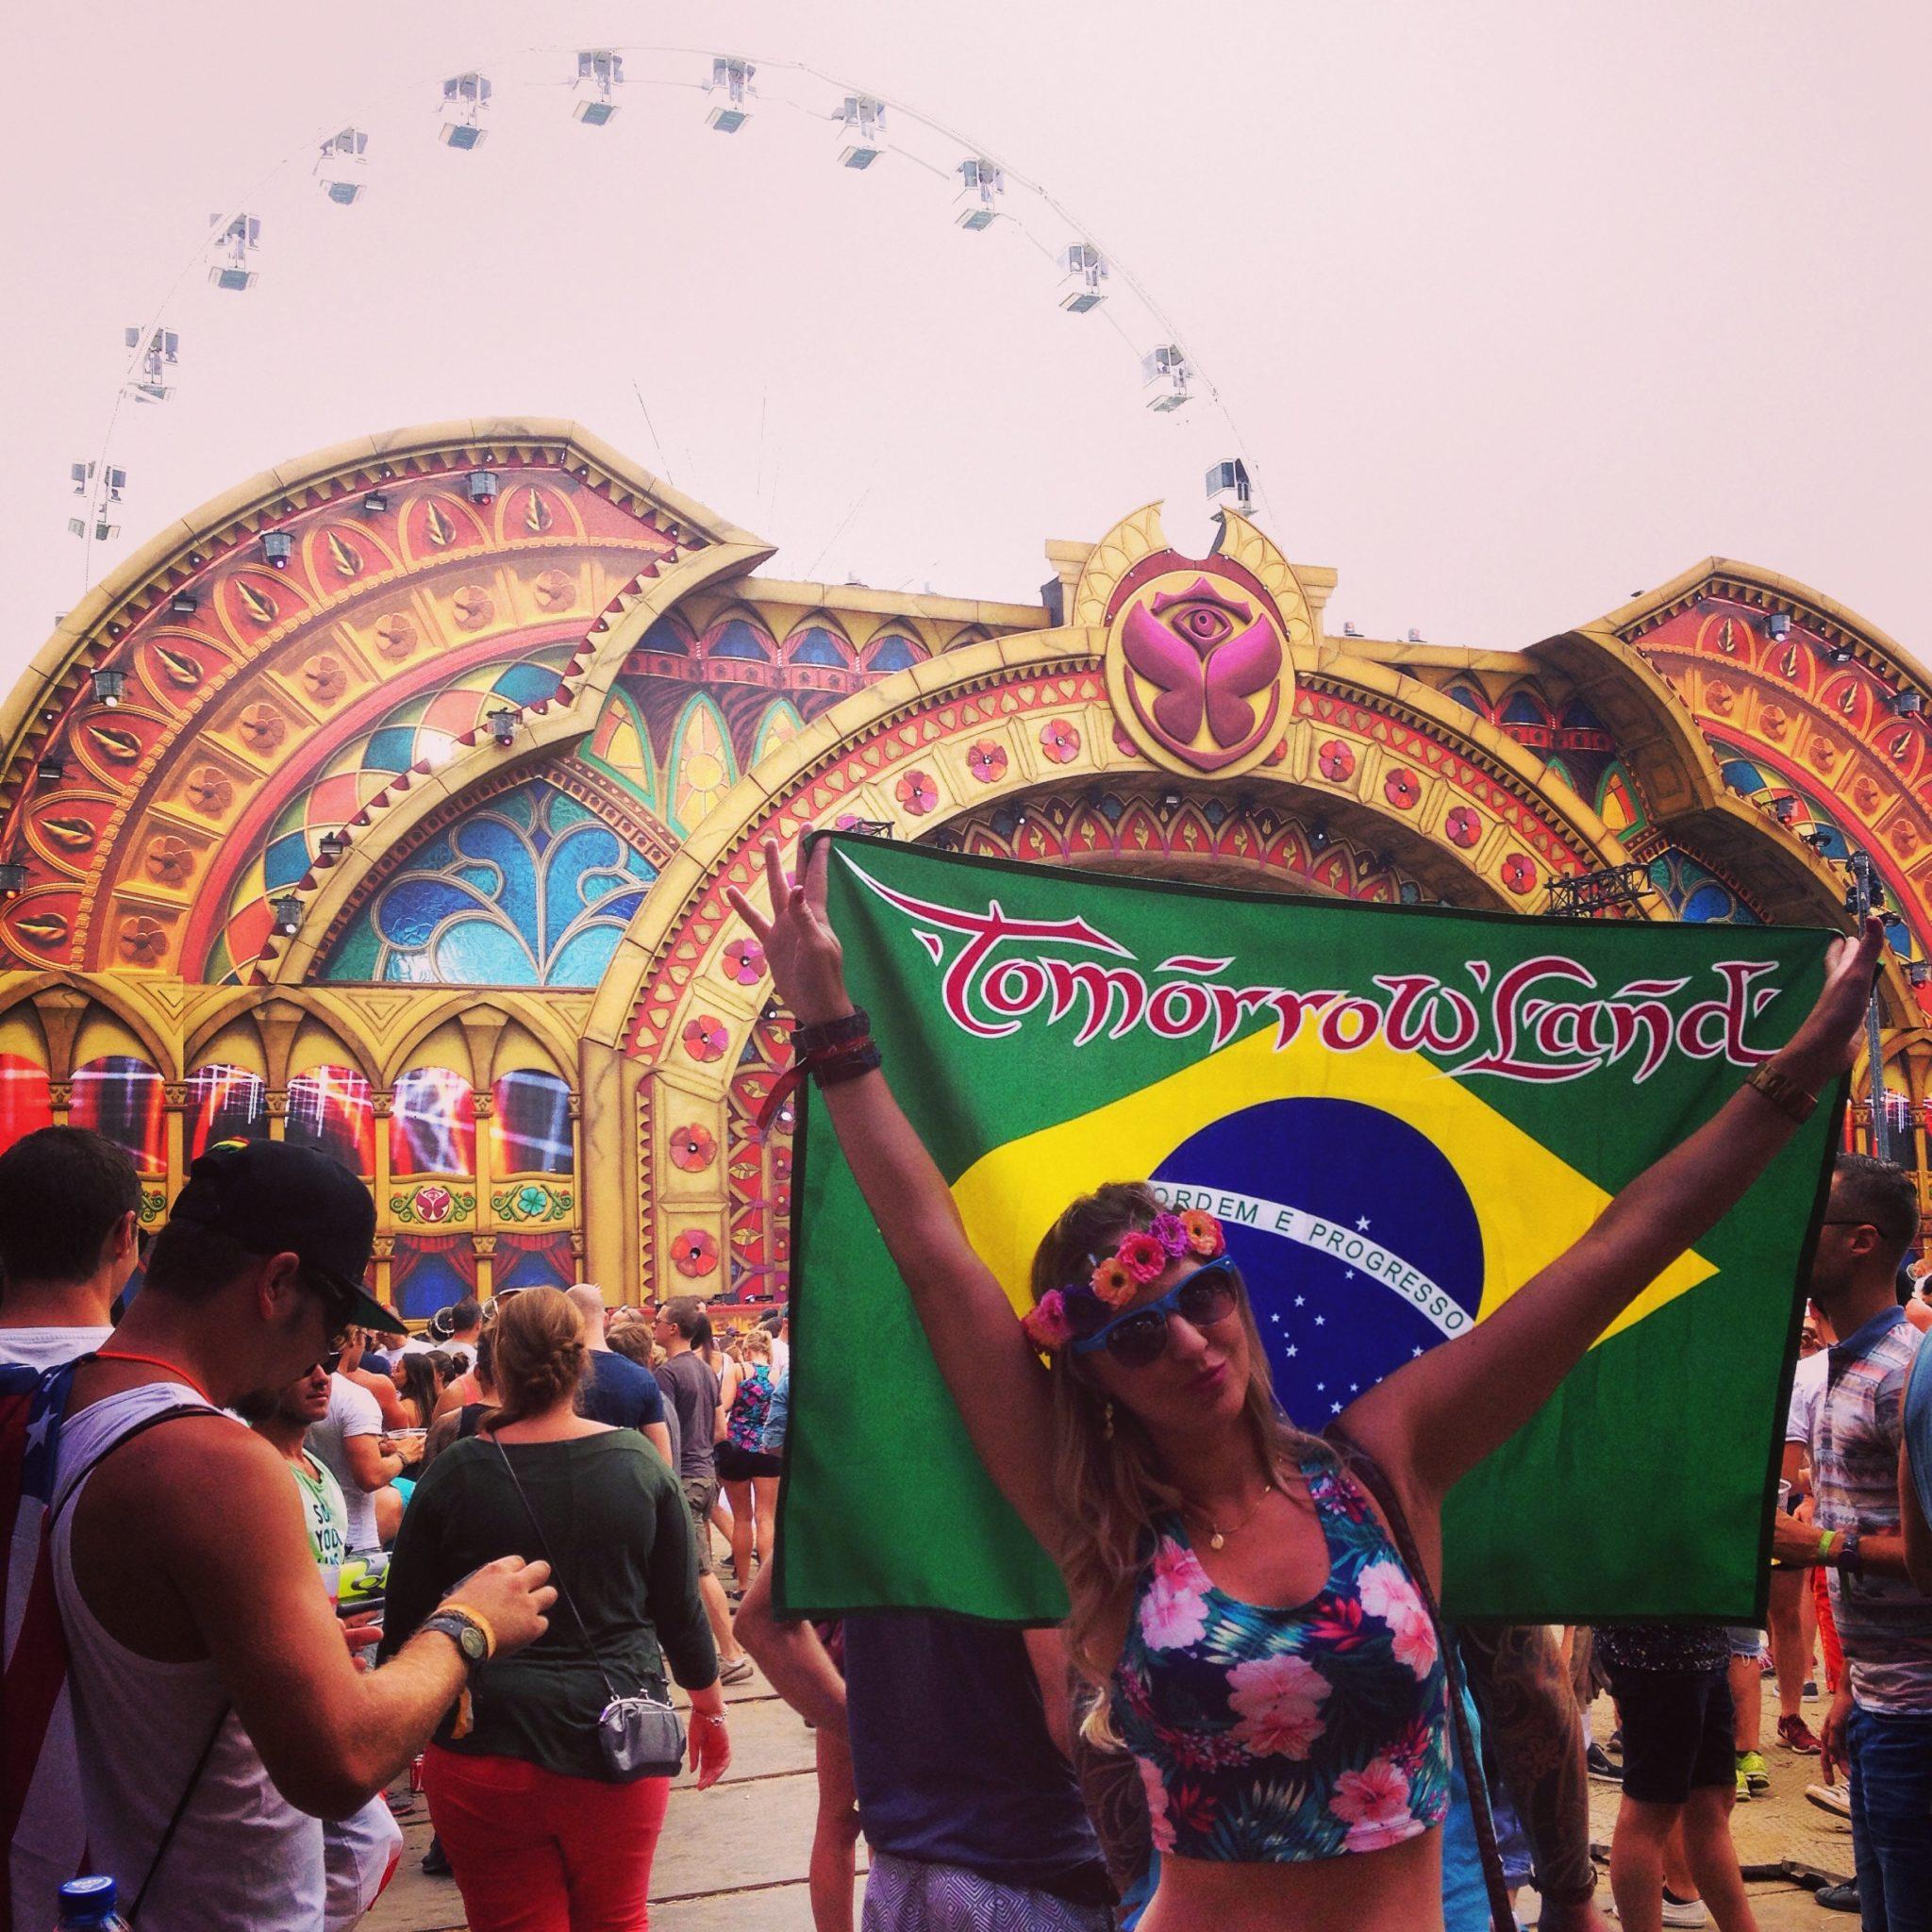 Tomorrowland Brasil anuncia lineup completo e lote extra de ingressos adriano pagani, arena maera, ingressos extra, lineup, Tomorrowland, tomorrowland brasil